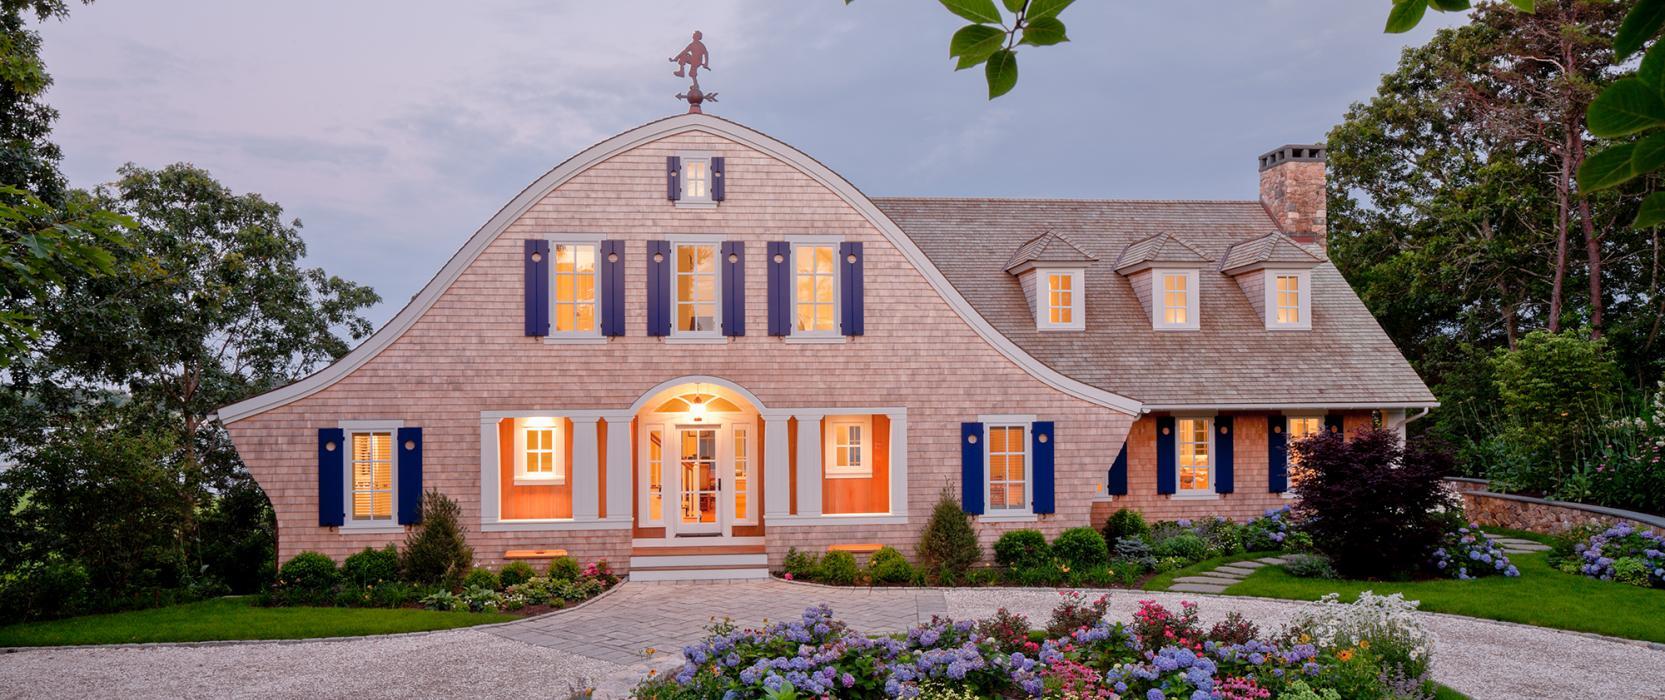 Luxury Cape Cod Shingle Waterfront Home